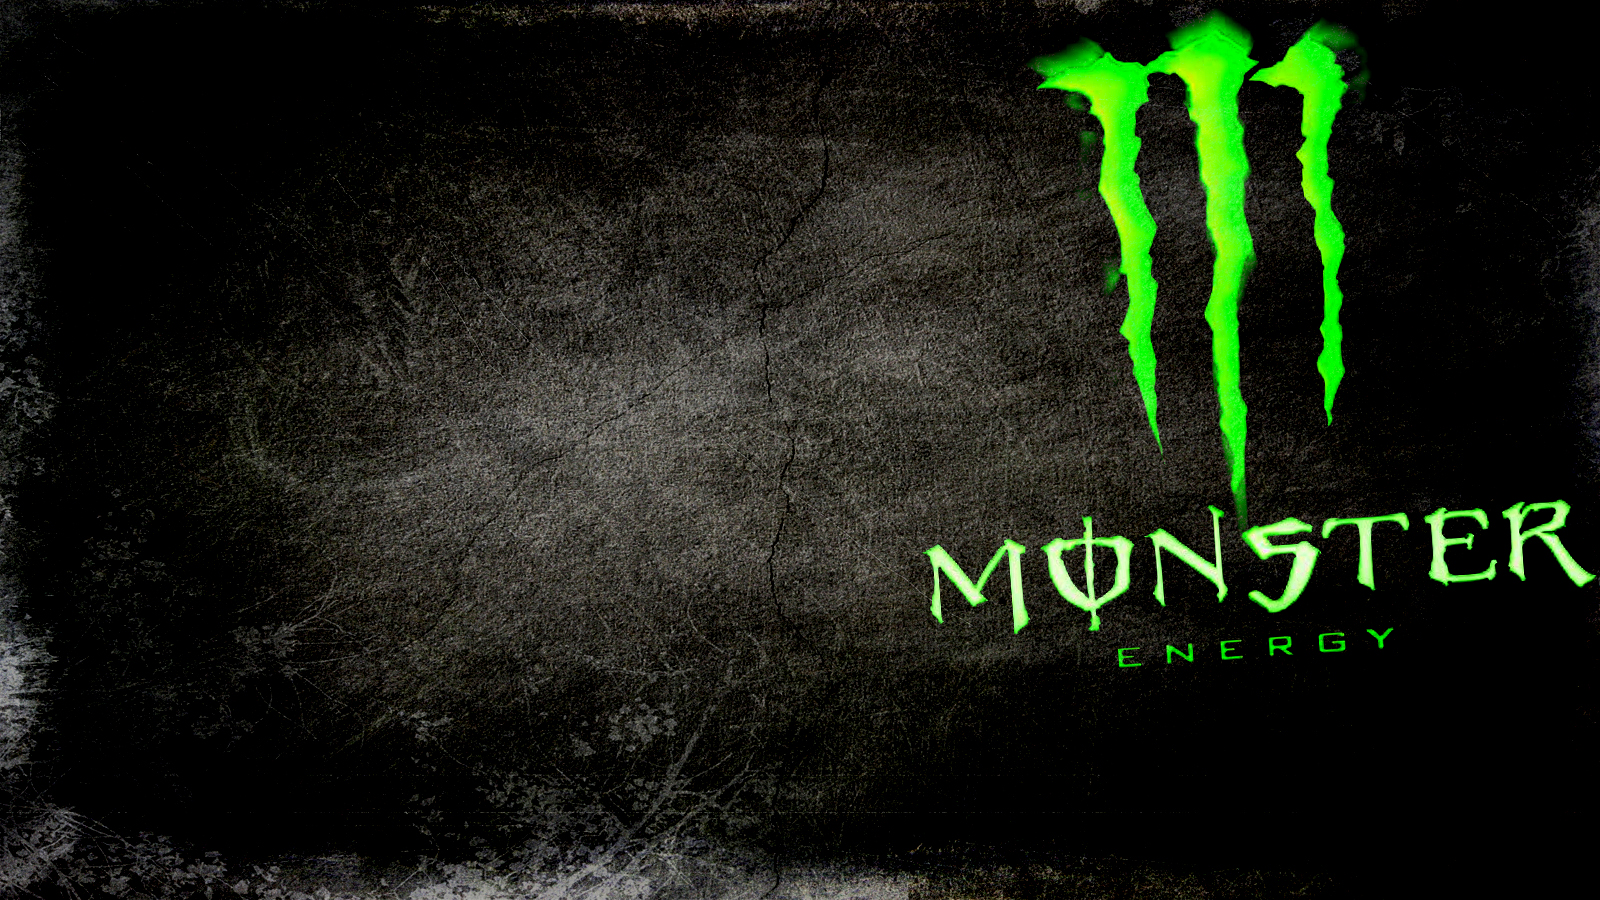 75 Monster Energy Drink Backgrounds On Wallpapersafari